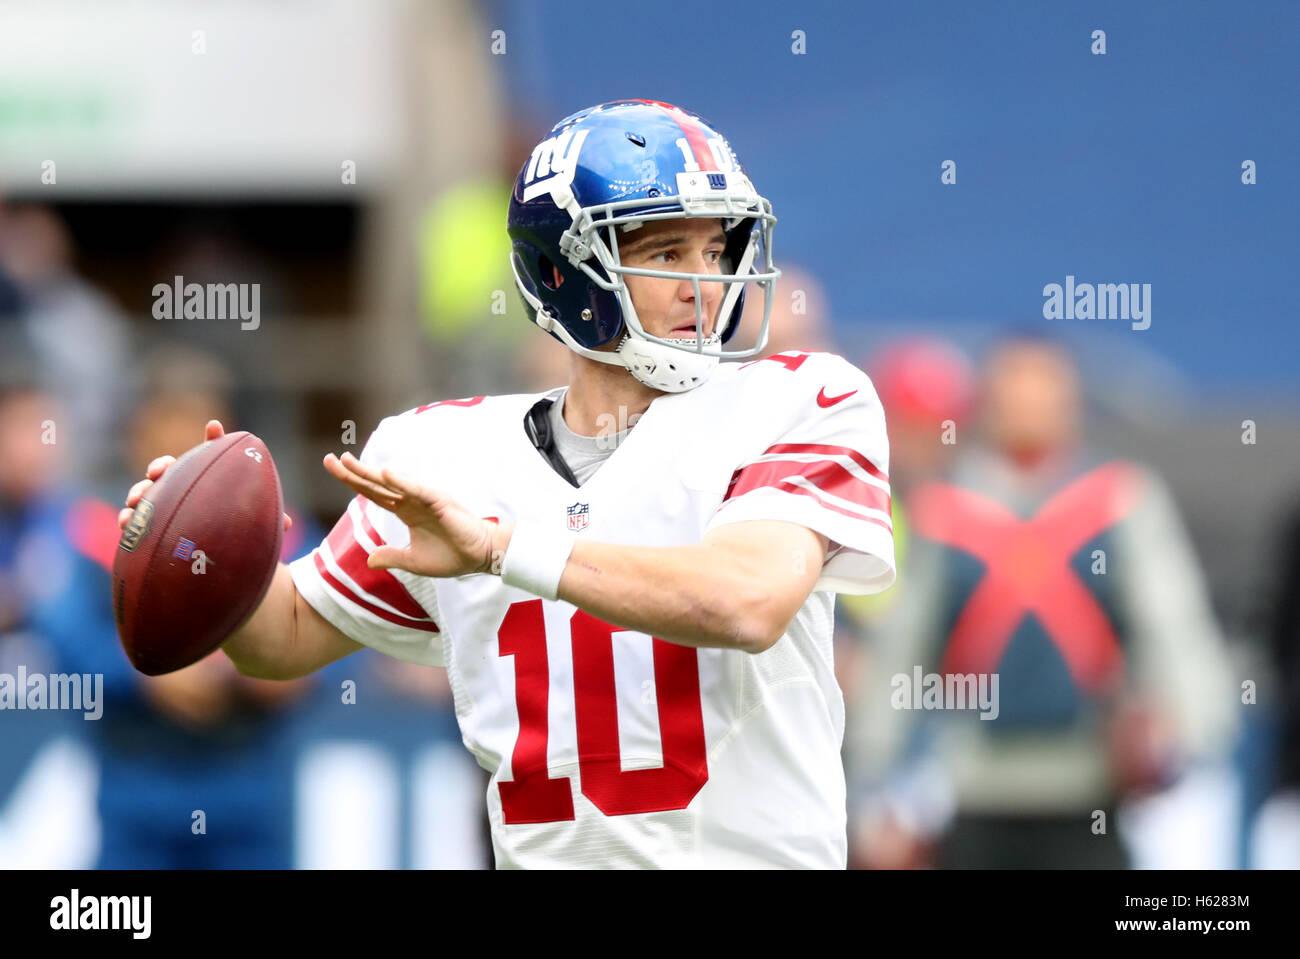 "New York Giants"" Eli Manning durante la NFL International Series corrispondono a Twickenham, Londra. Immagini Stock"